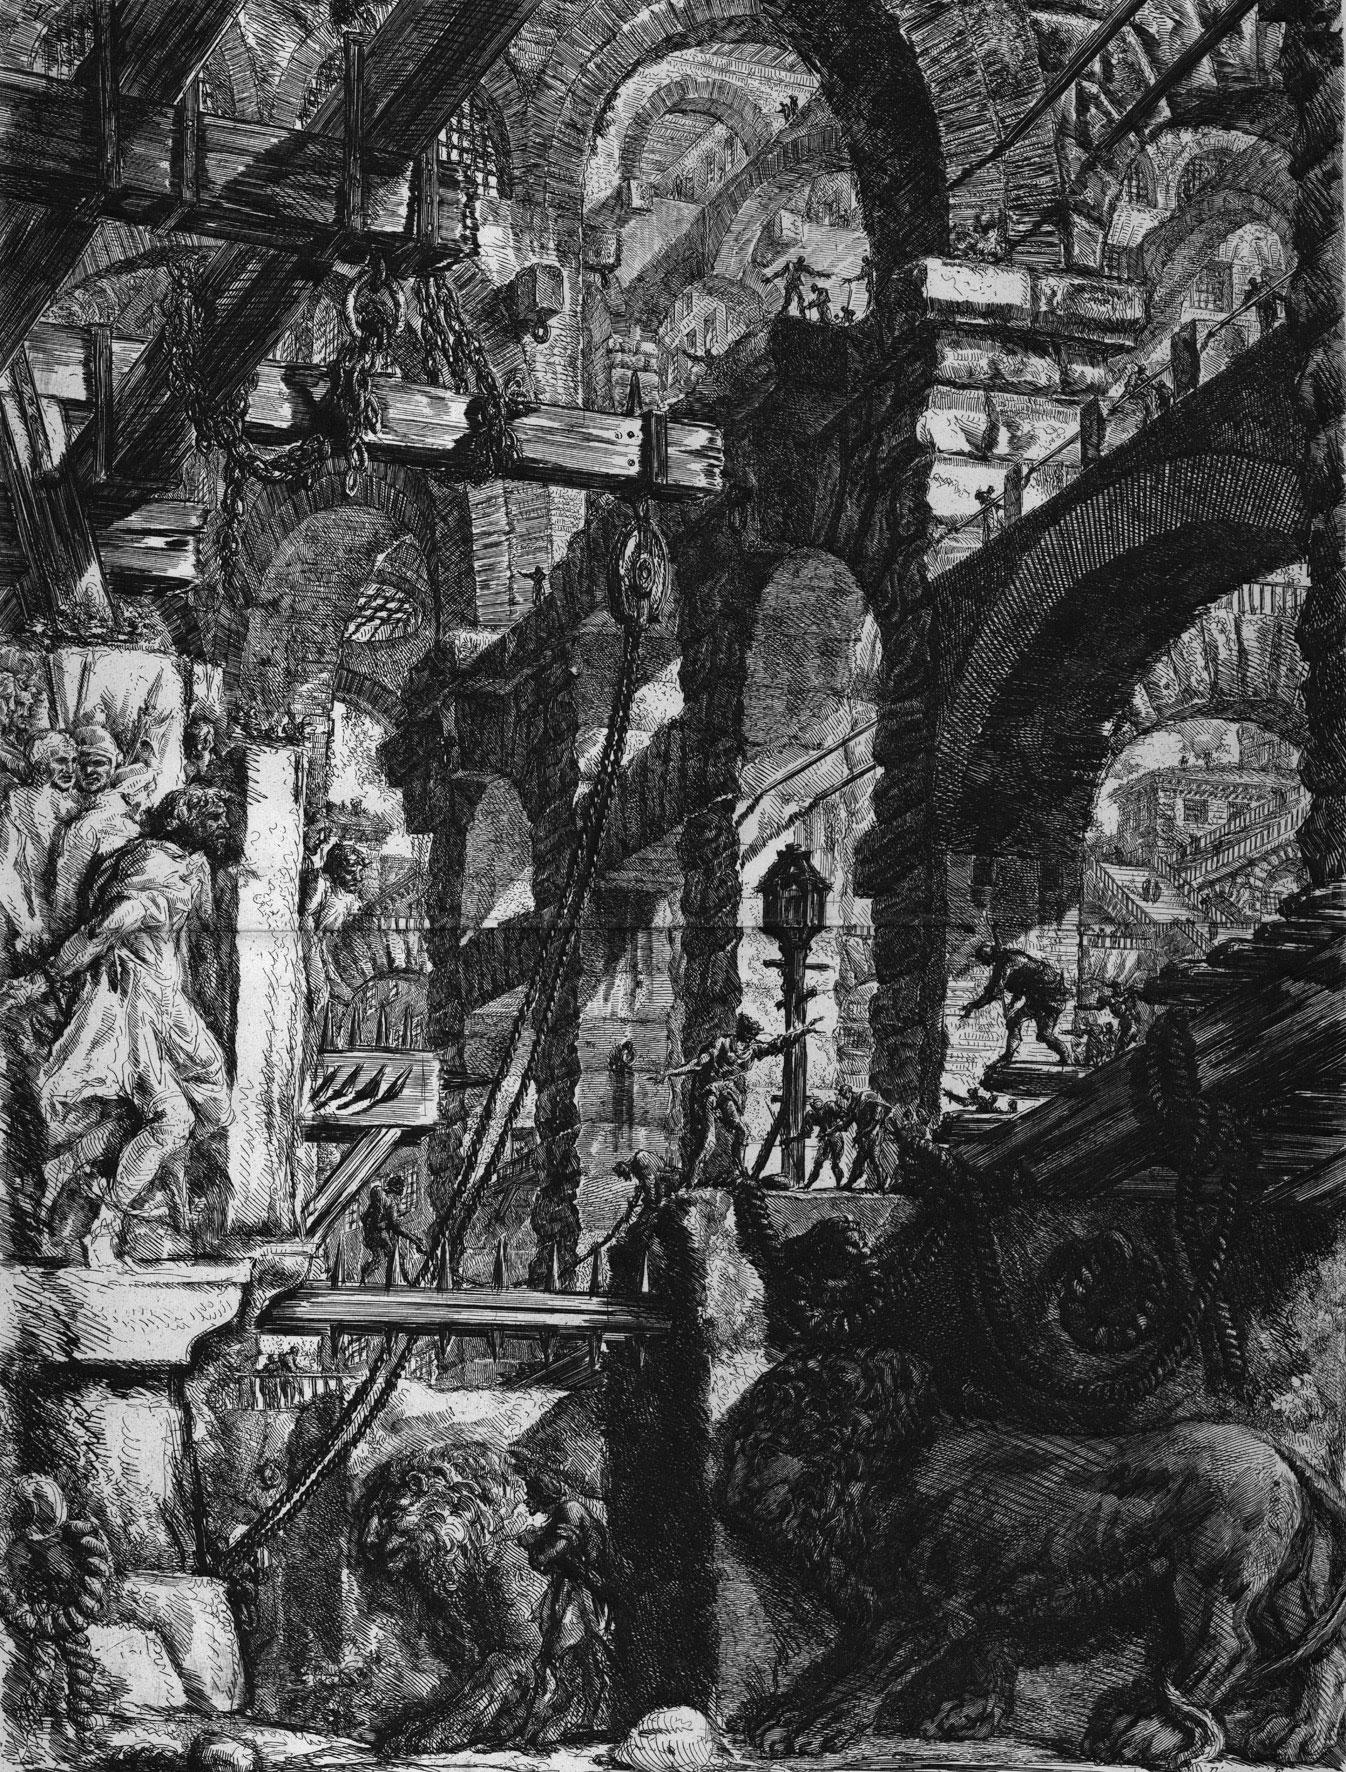 G.B.-Piranesi,-from-the-series-ÔÇ£Carceri-dÔÇÖinvenzione,ÔÇØ-ca.-1761Venezia,-..